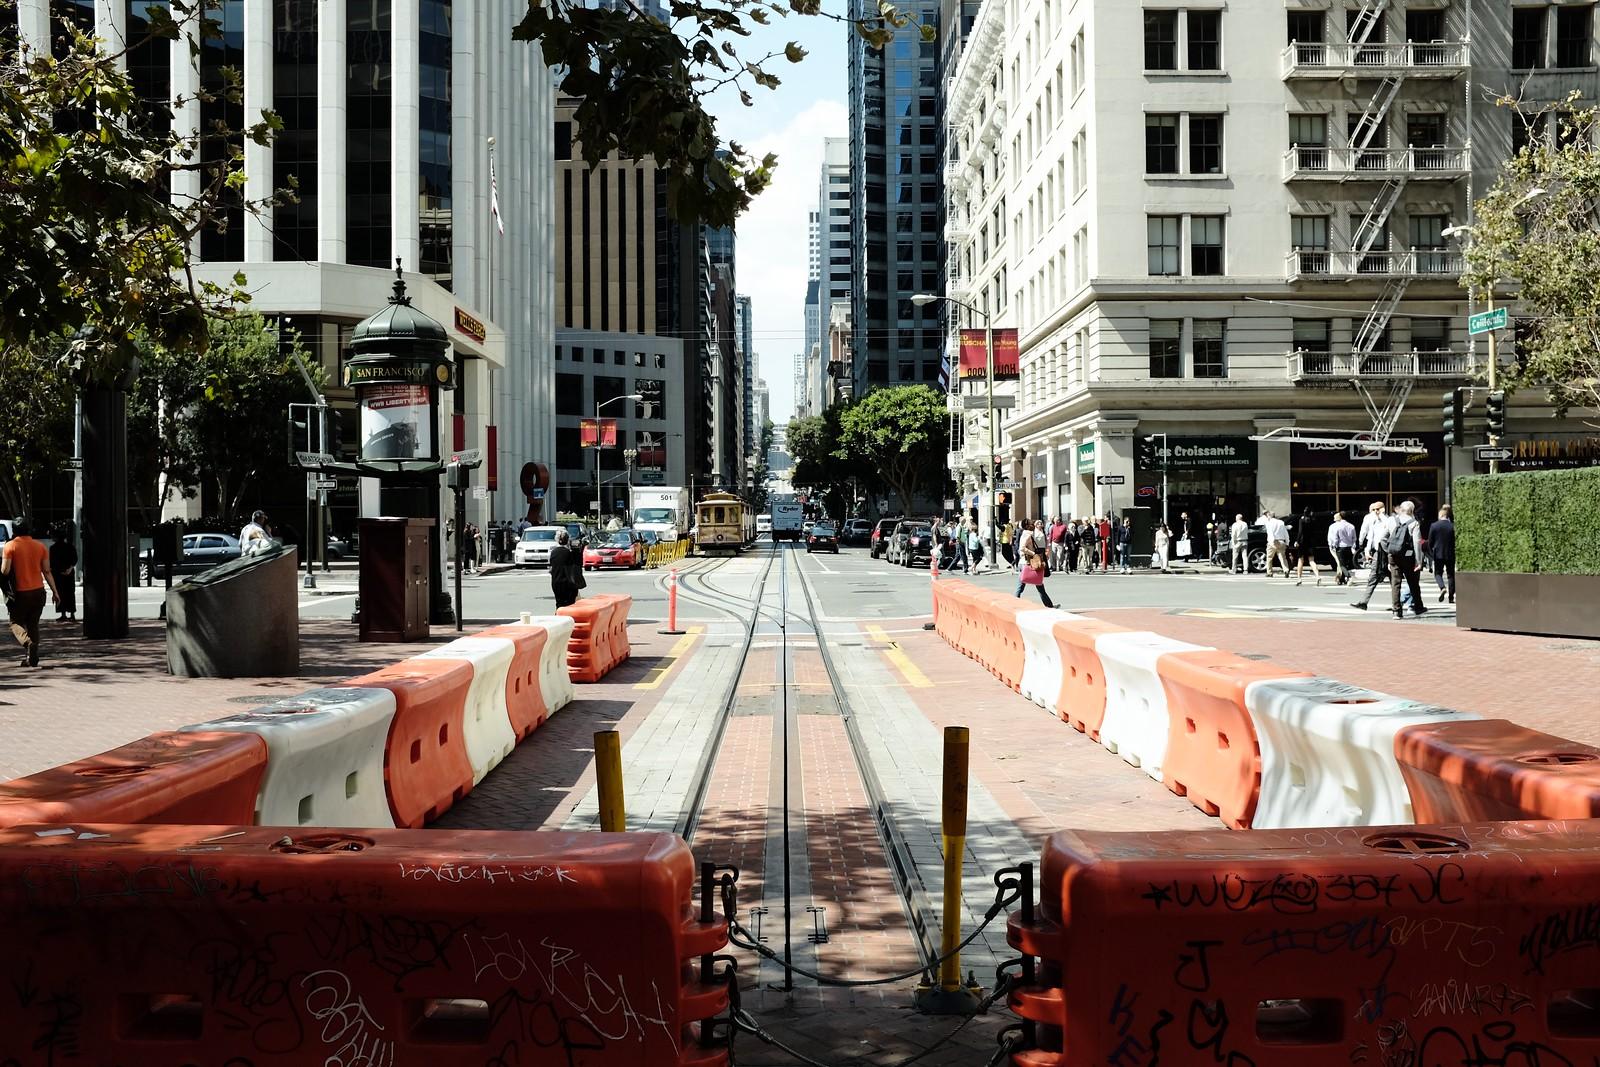 San Francisco by FUJIFILM X100S.